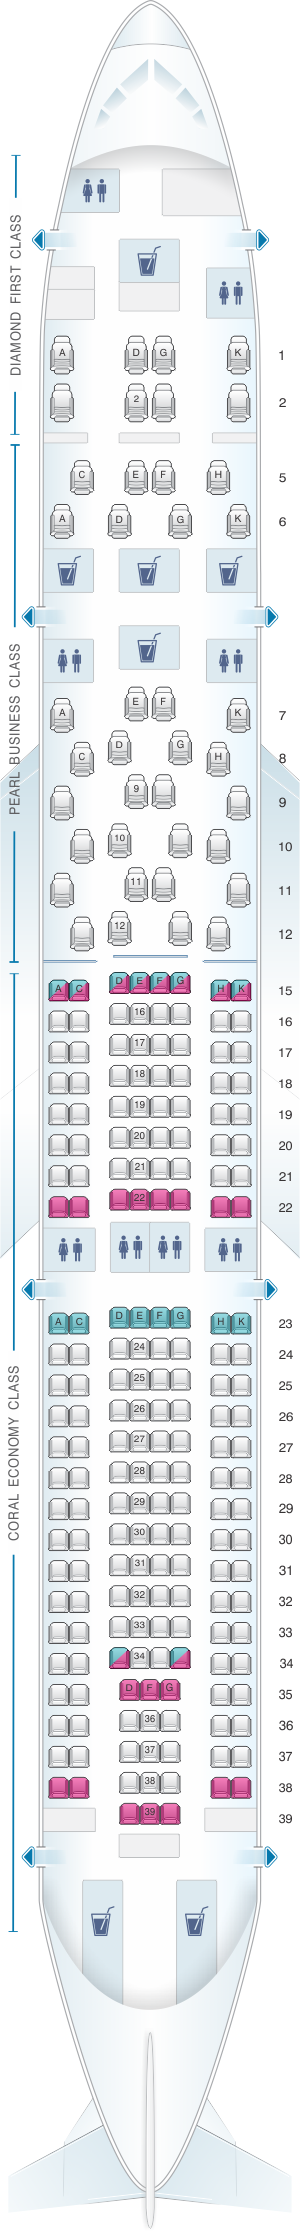 Seat map for Etihad Airways Airbus A330 300